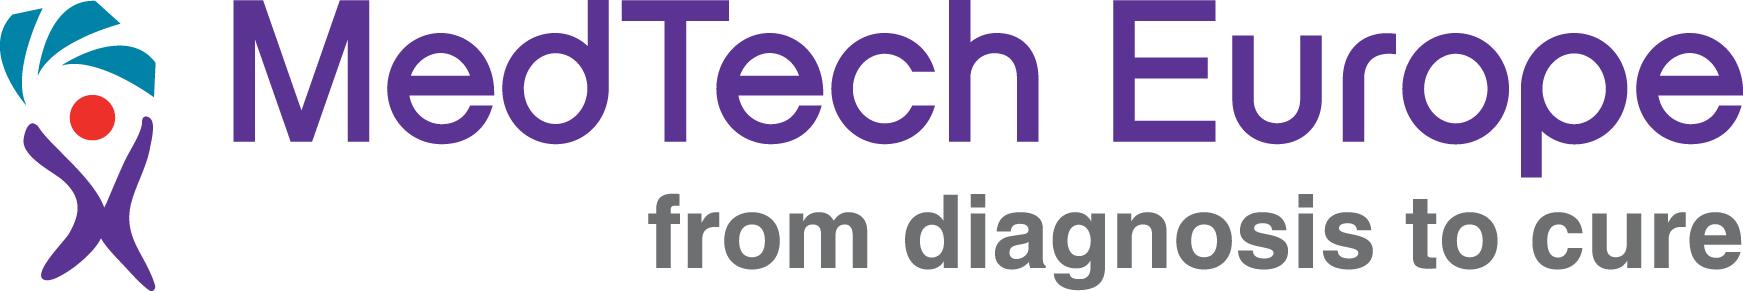 MedTech Europe logo.png